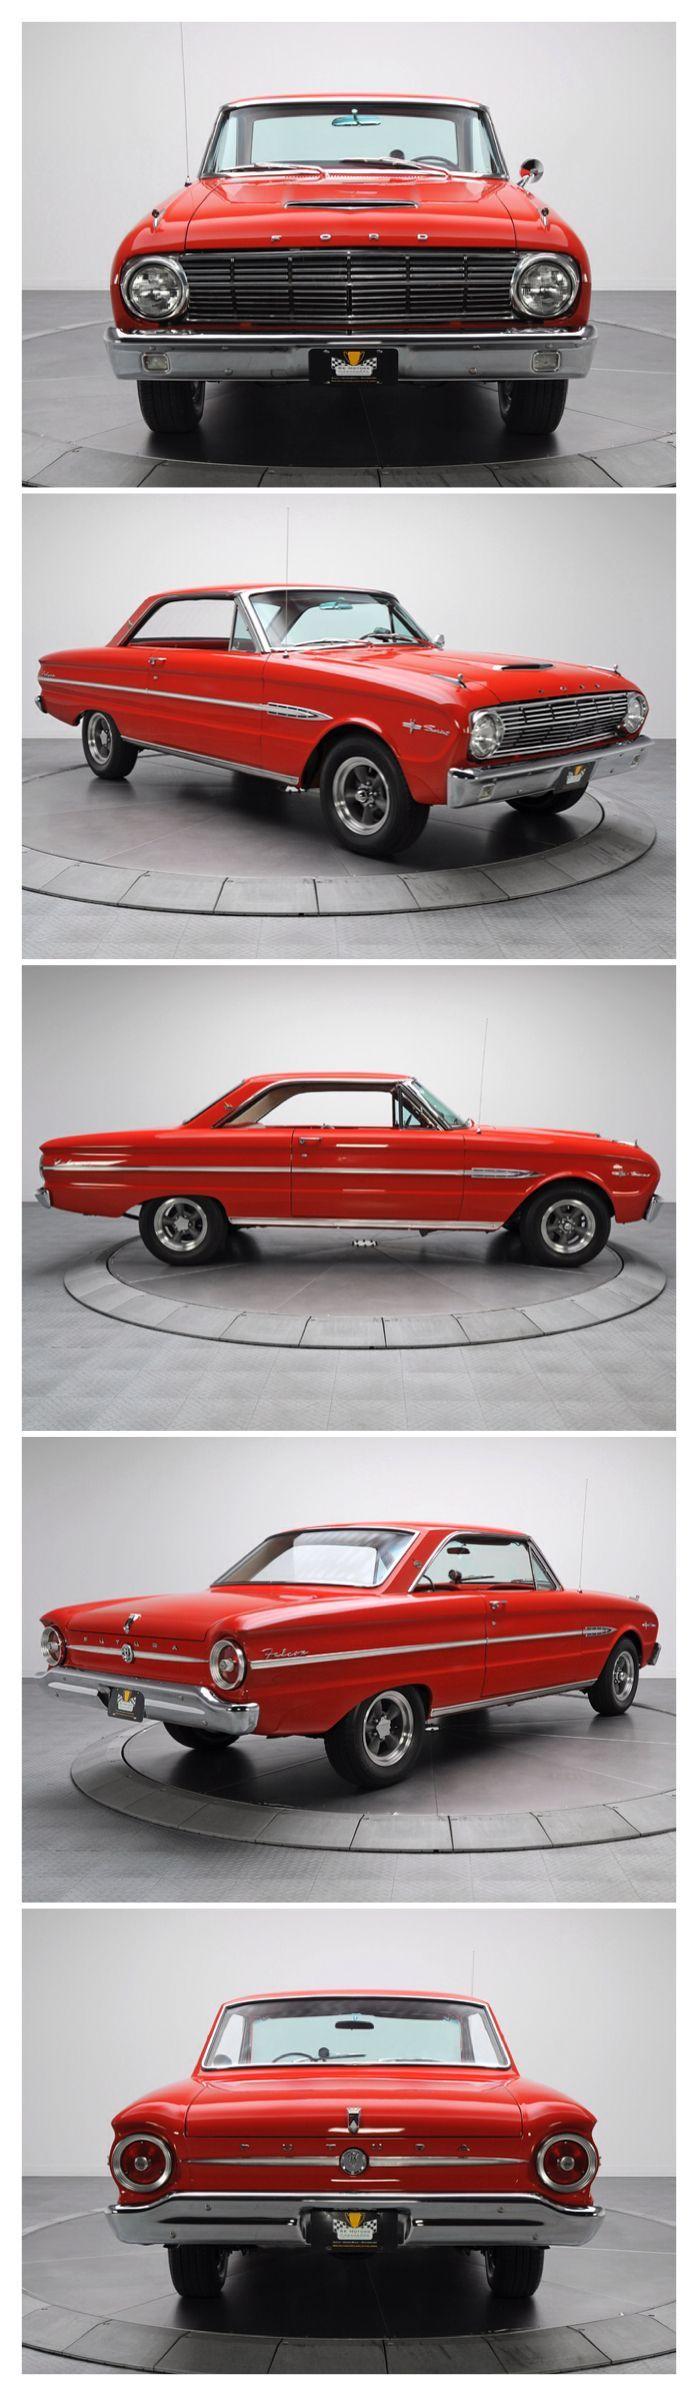 1963 Ford Falcon Futura Sprint - https://www.luxury.guugles.com/1963-ford-falcon-futura-sprint/